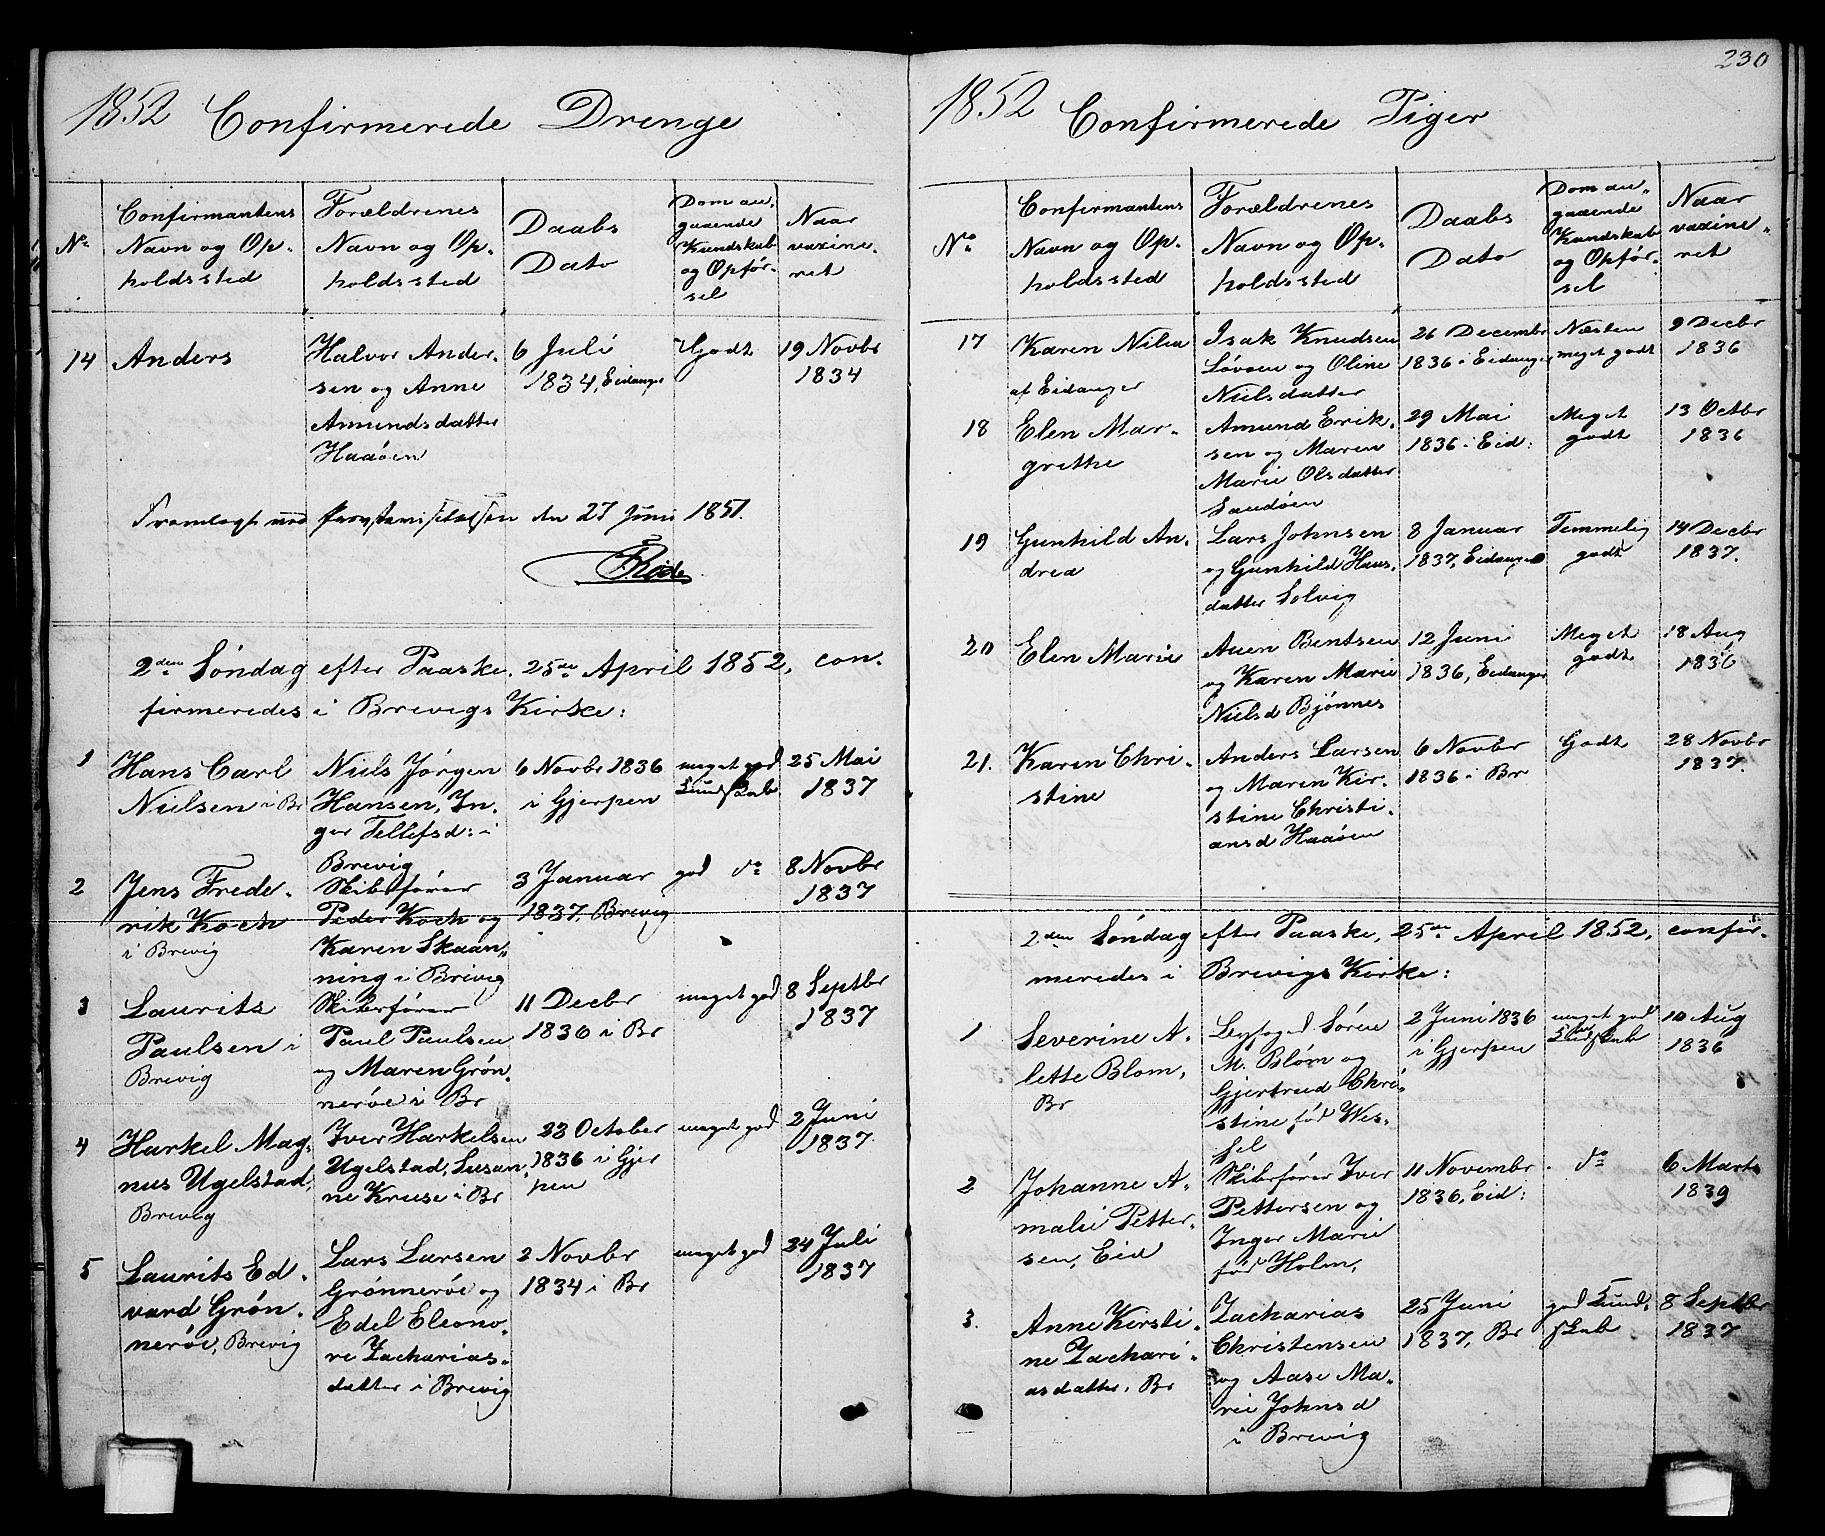 SAKO, Brevik kirkebøker, G/Ga/L0002: Klokkerbok nr. 2, 1846-1865, s. 230